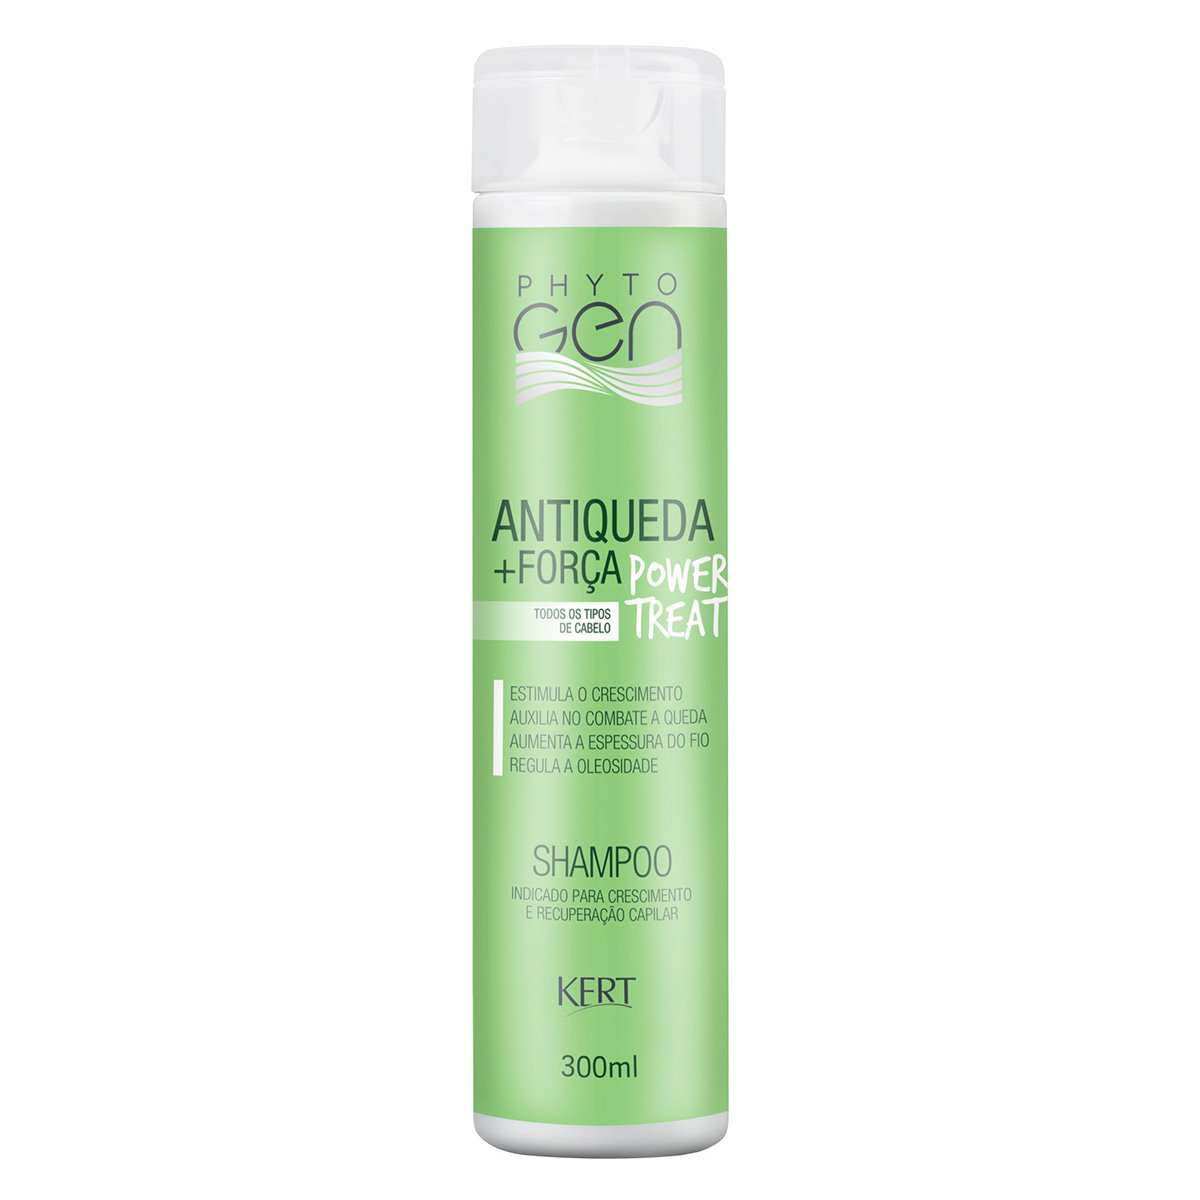 Shampoo Phytogen Antiqueda 300ml